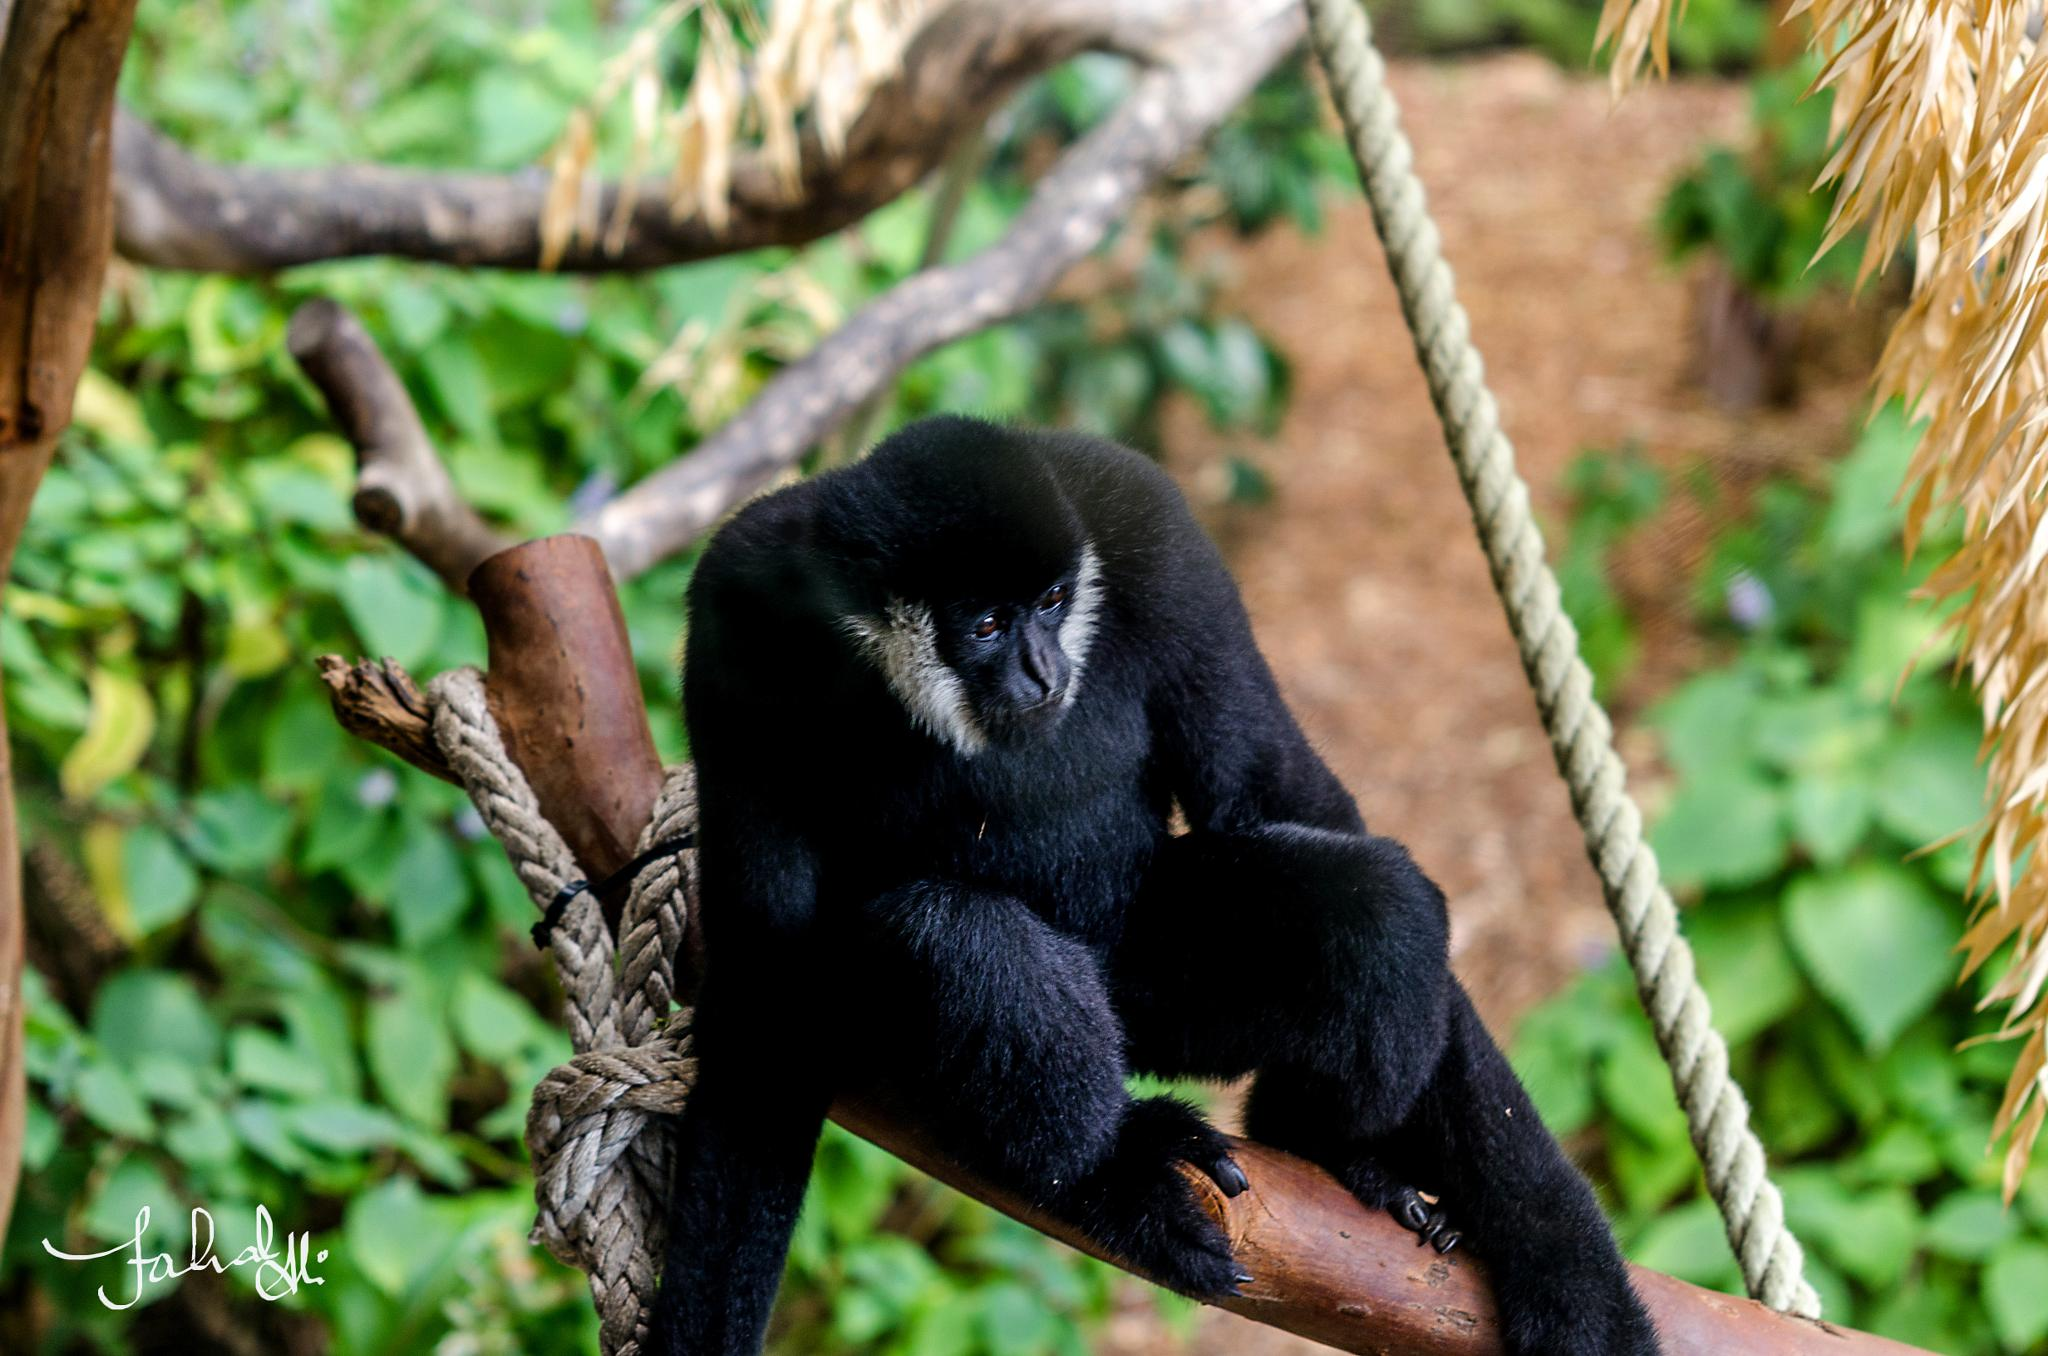 Tree-top apes by Fahad Bhatti